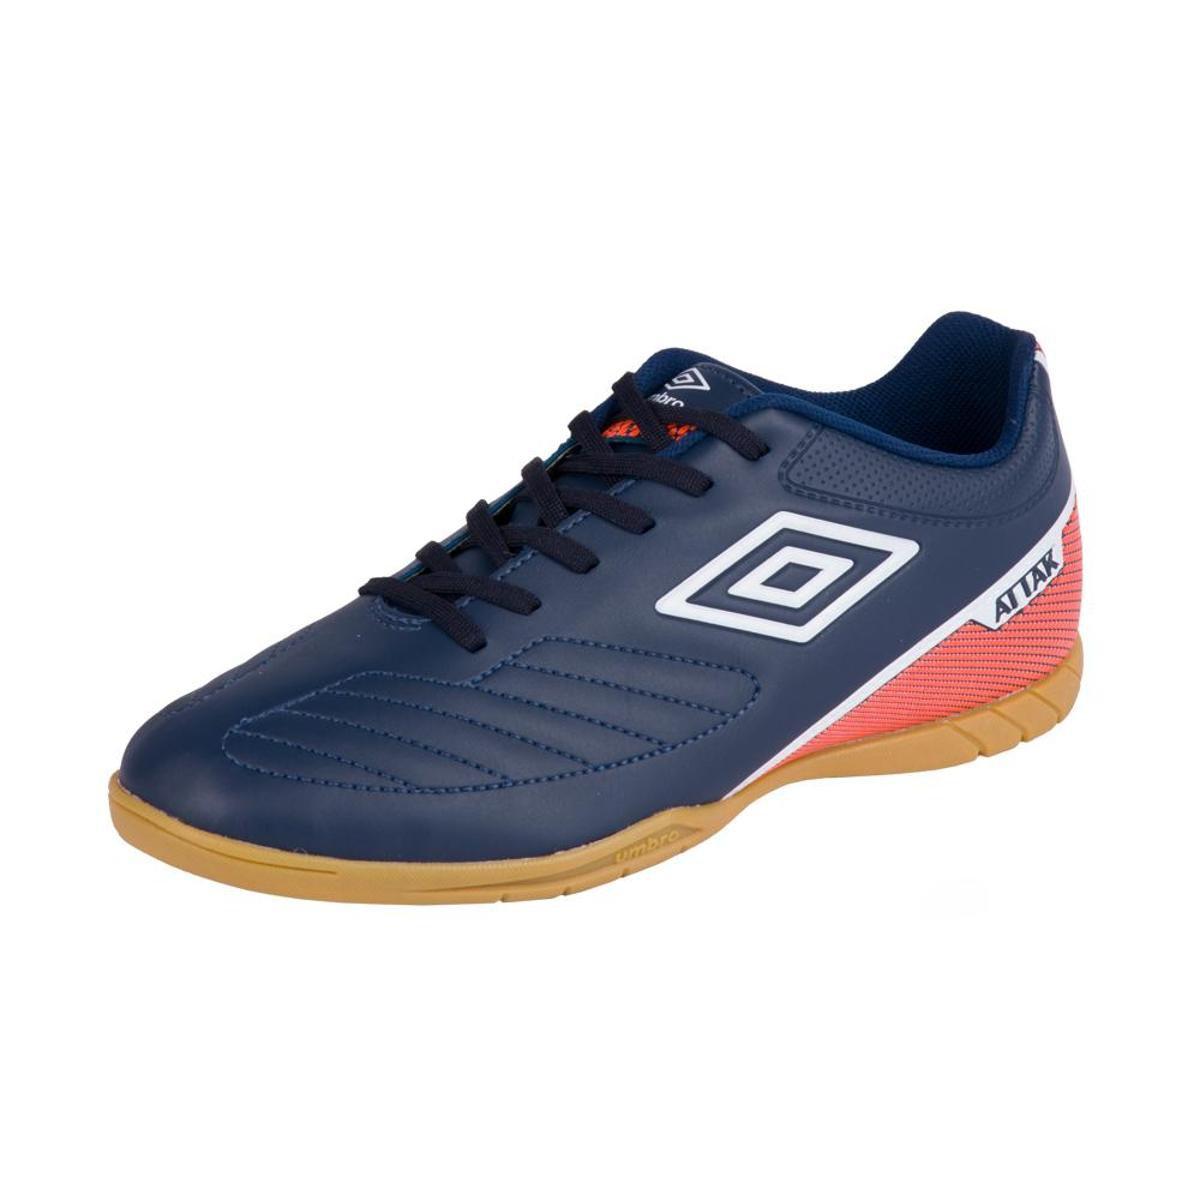 7bd69cd6af5 Chuteira Futsal Umbro Attak II - Compre Agora